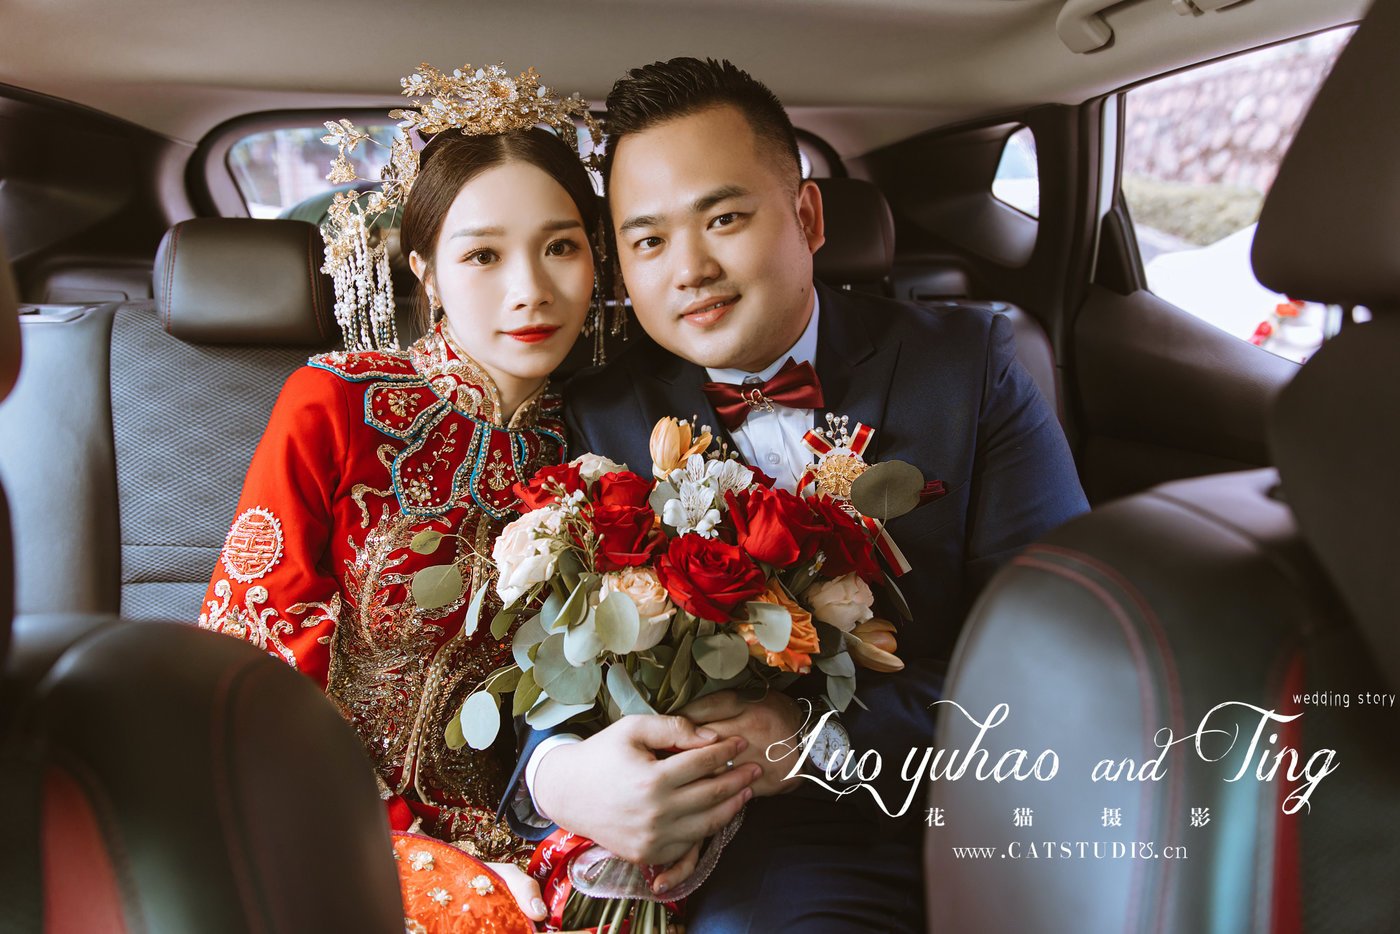 wedding day-ting(总监作品)10